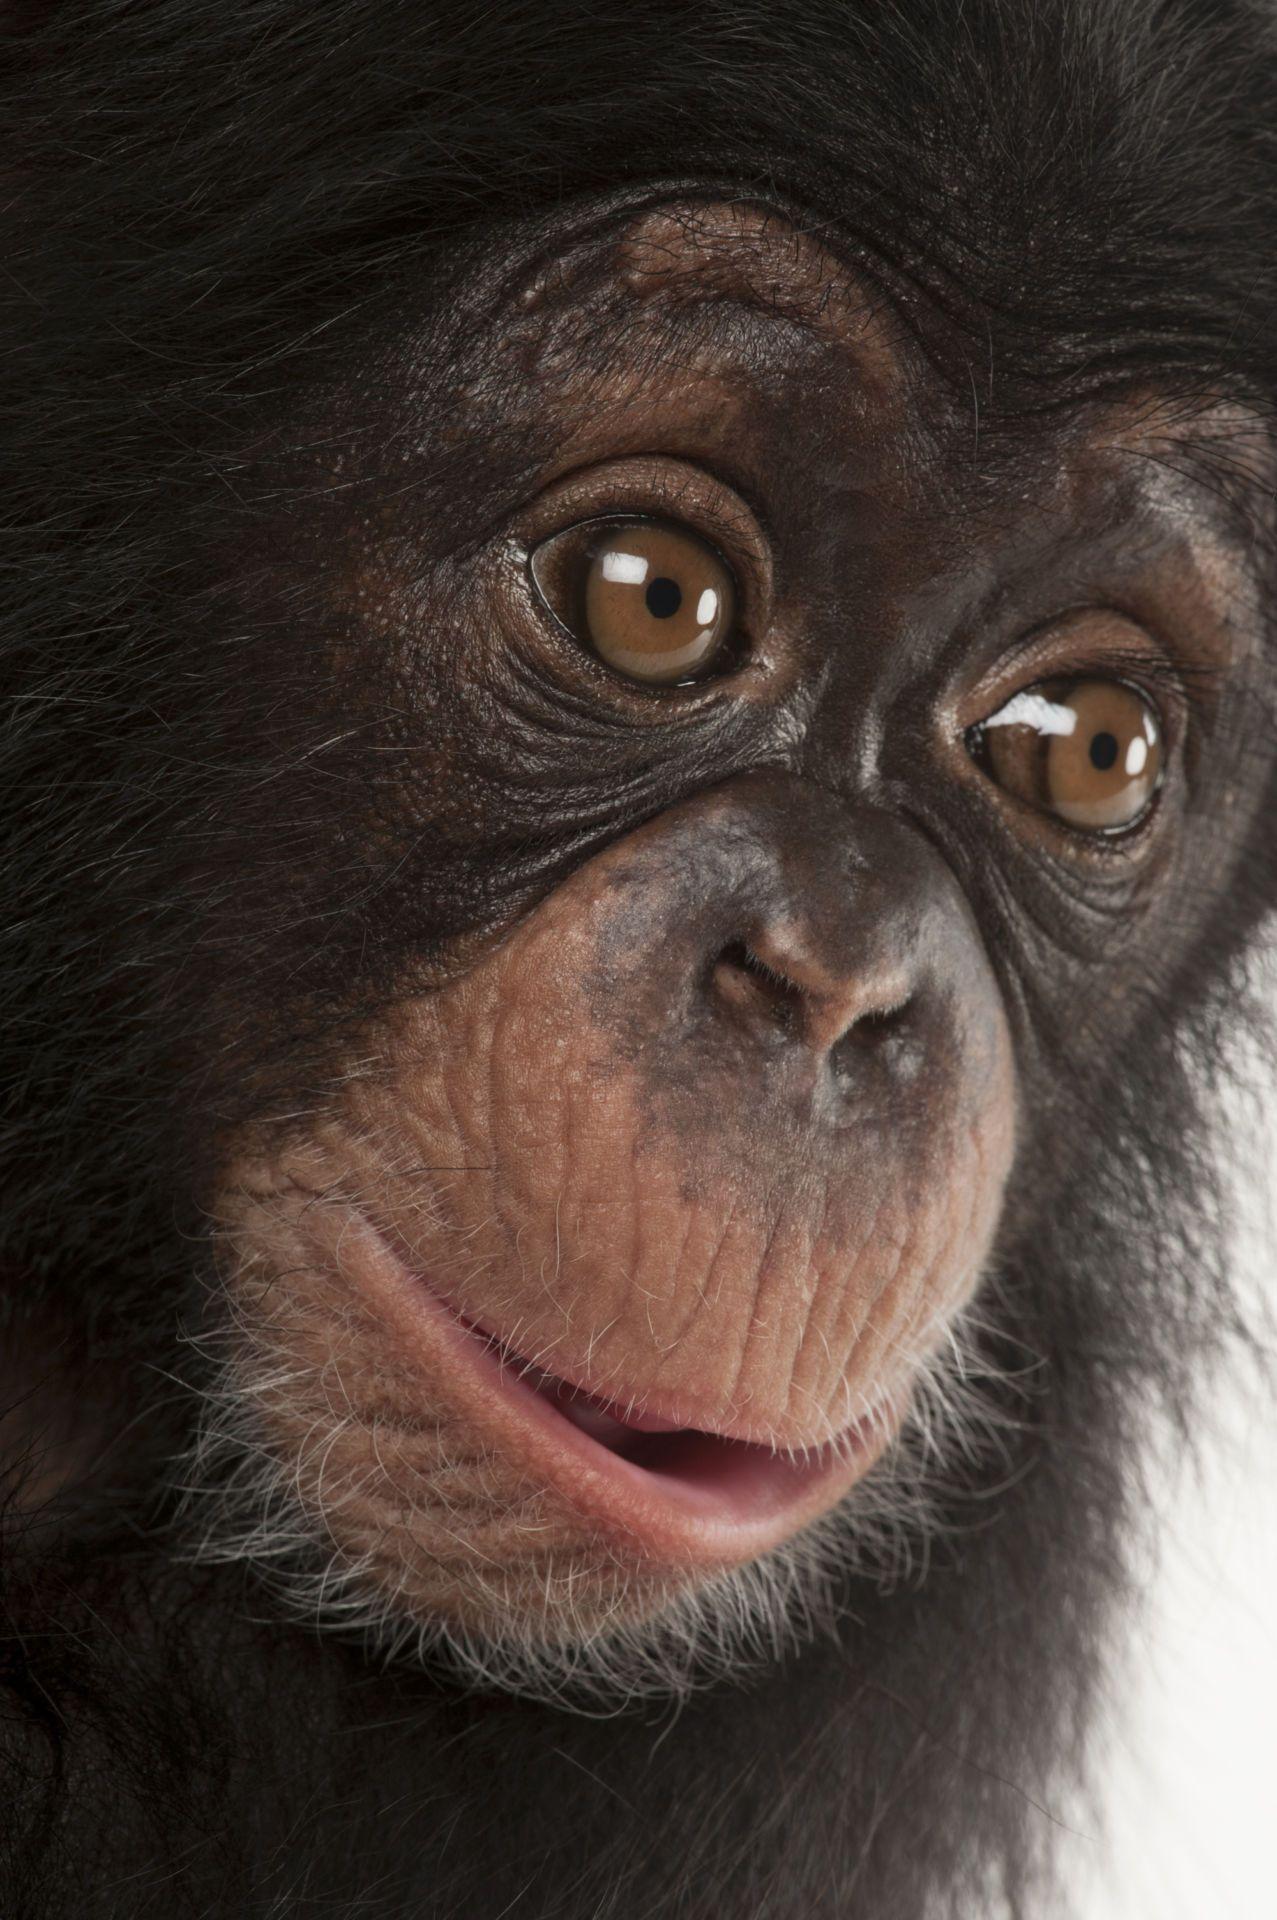 ANI040-00249 | Baby chimpanzee, Chimpanzee, Cute wild animals